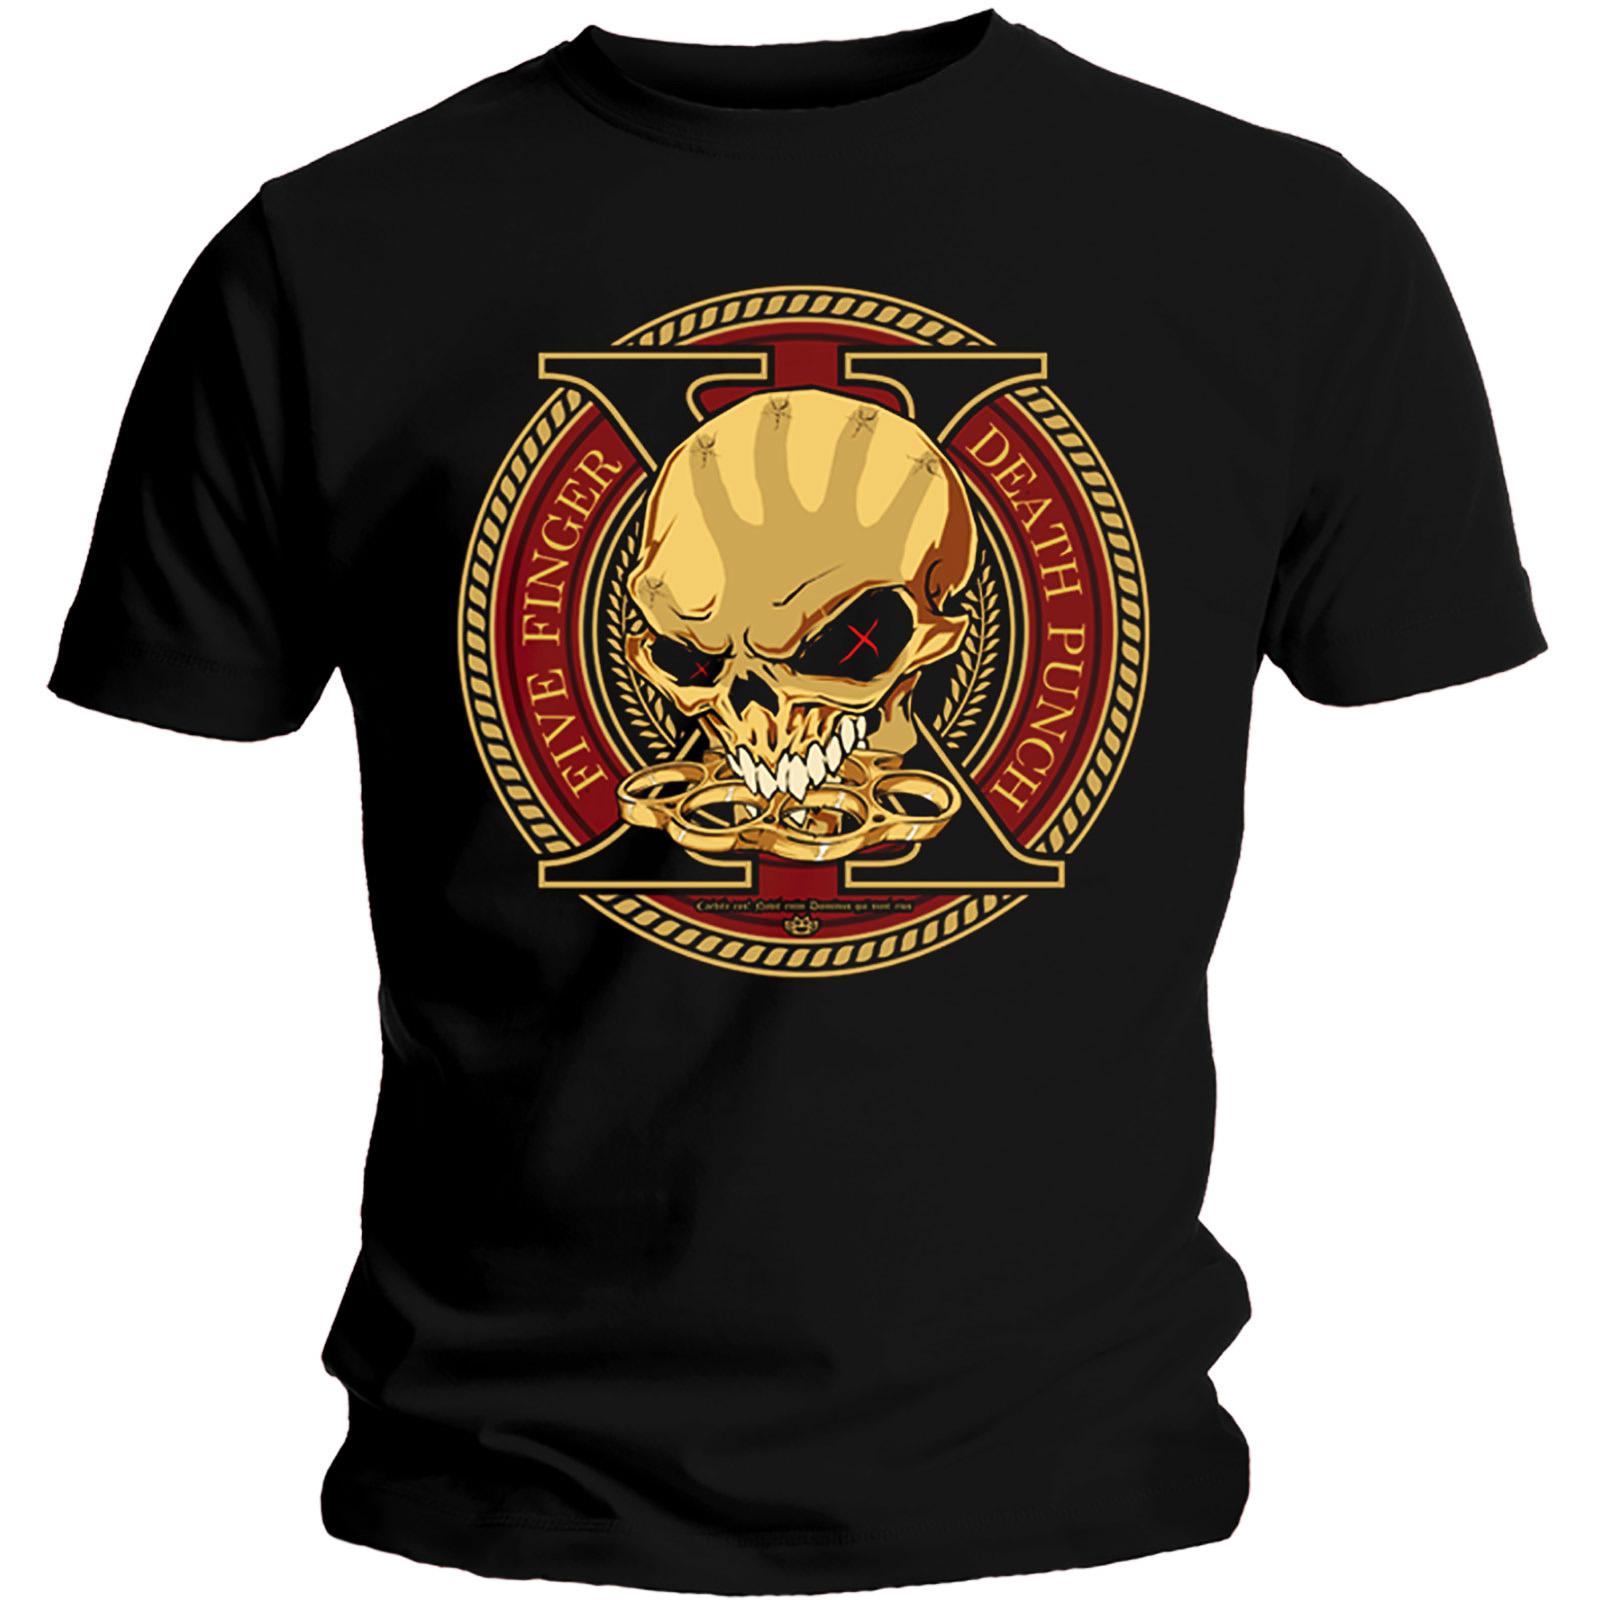 Official-T-Shirt-Five-Finger-Death-Punch-Album-DECADE-of-Destruction-All-Sizes thumbnail 7